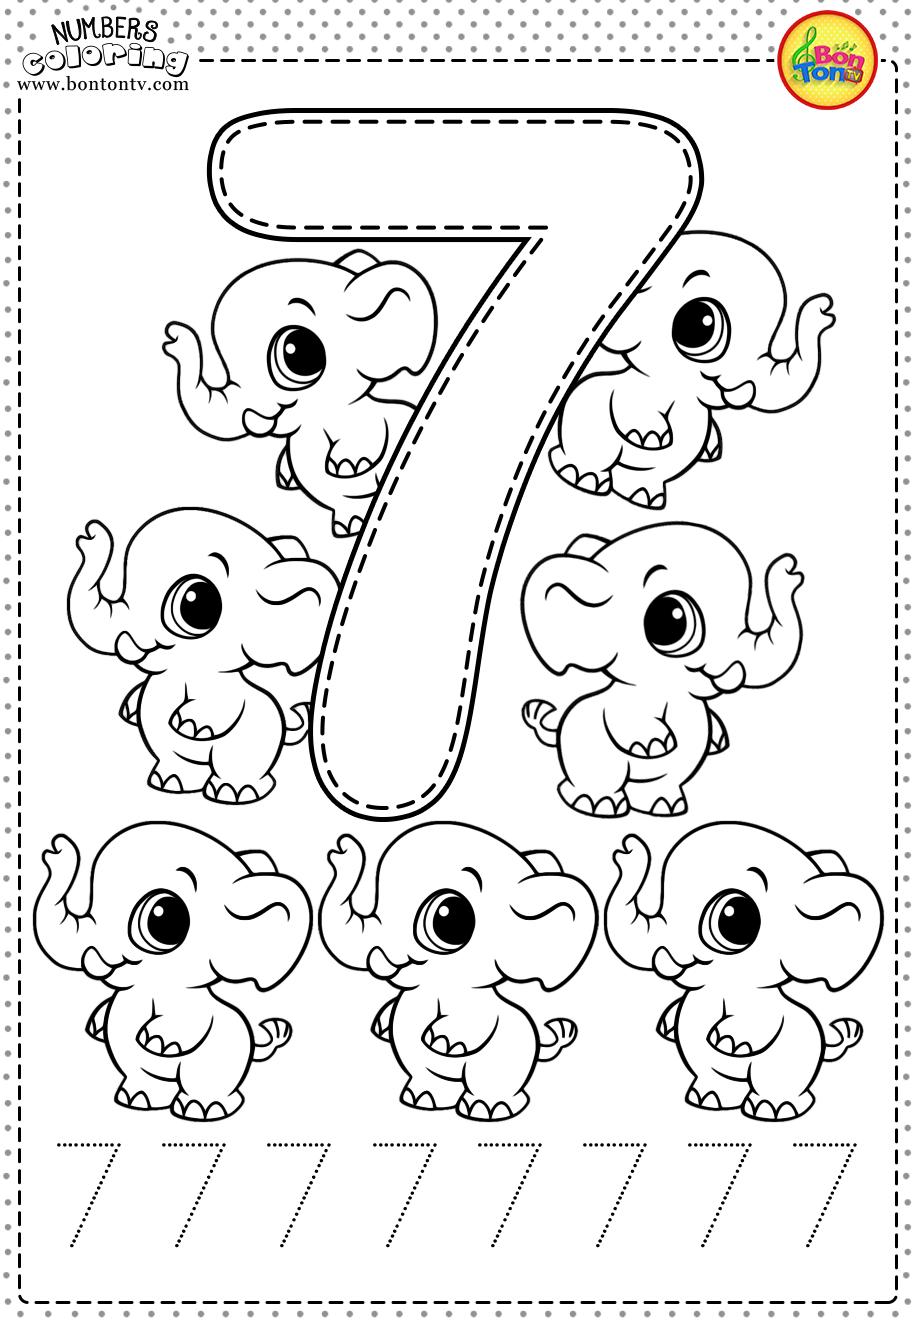 Number 7 Preschool Printables Free Worksheets And Coloring Pages For Kids Learning N Okul Oncesi Calisma Cizelgeleri Anaokulu Matematigi Cocuklari Buyutme